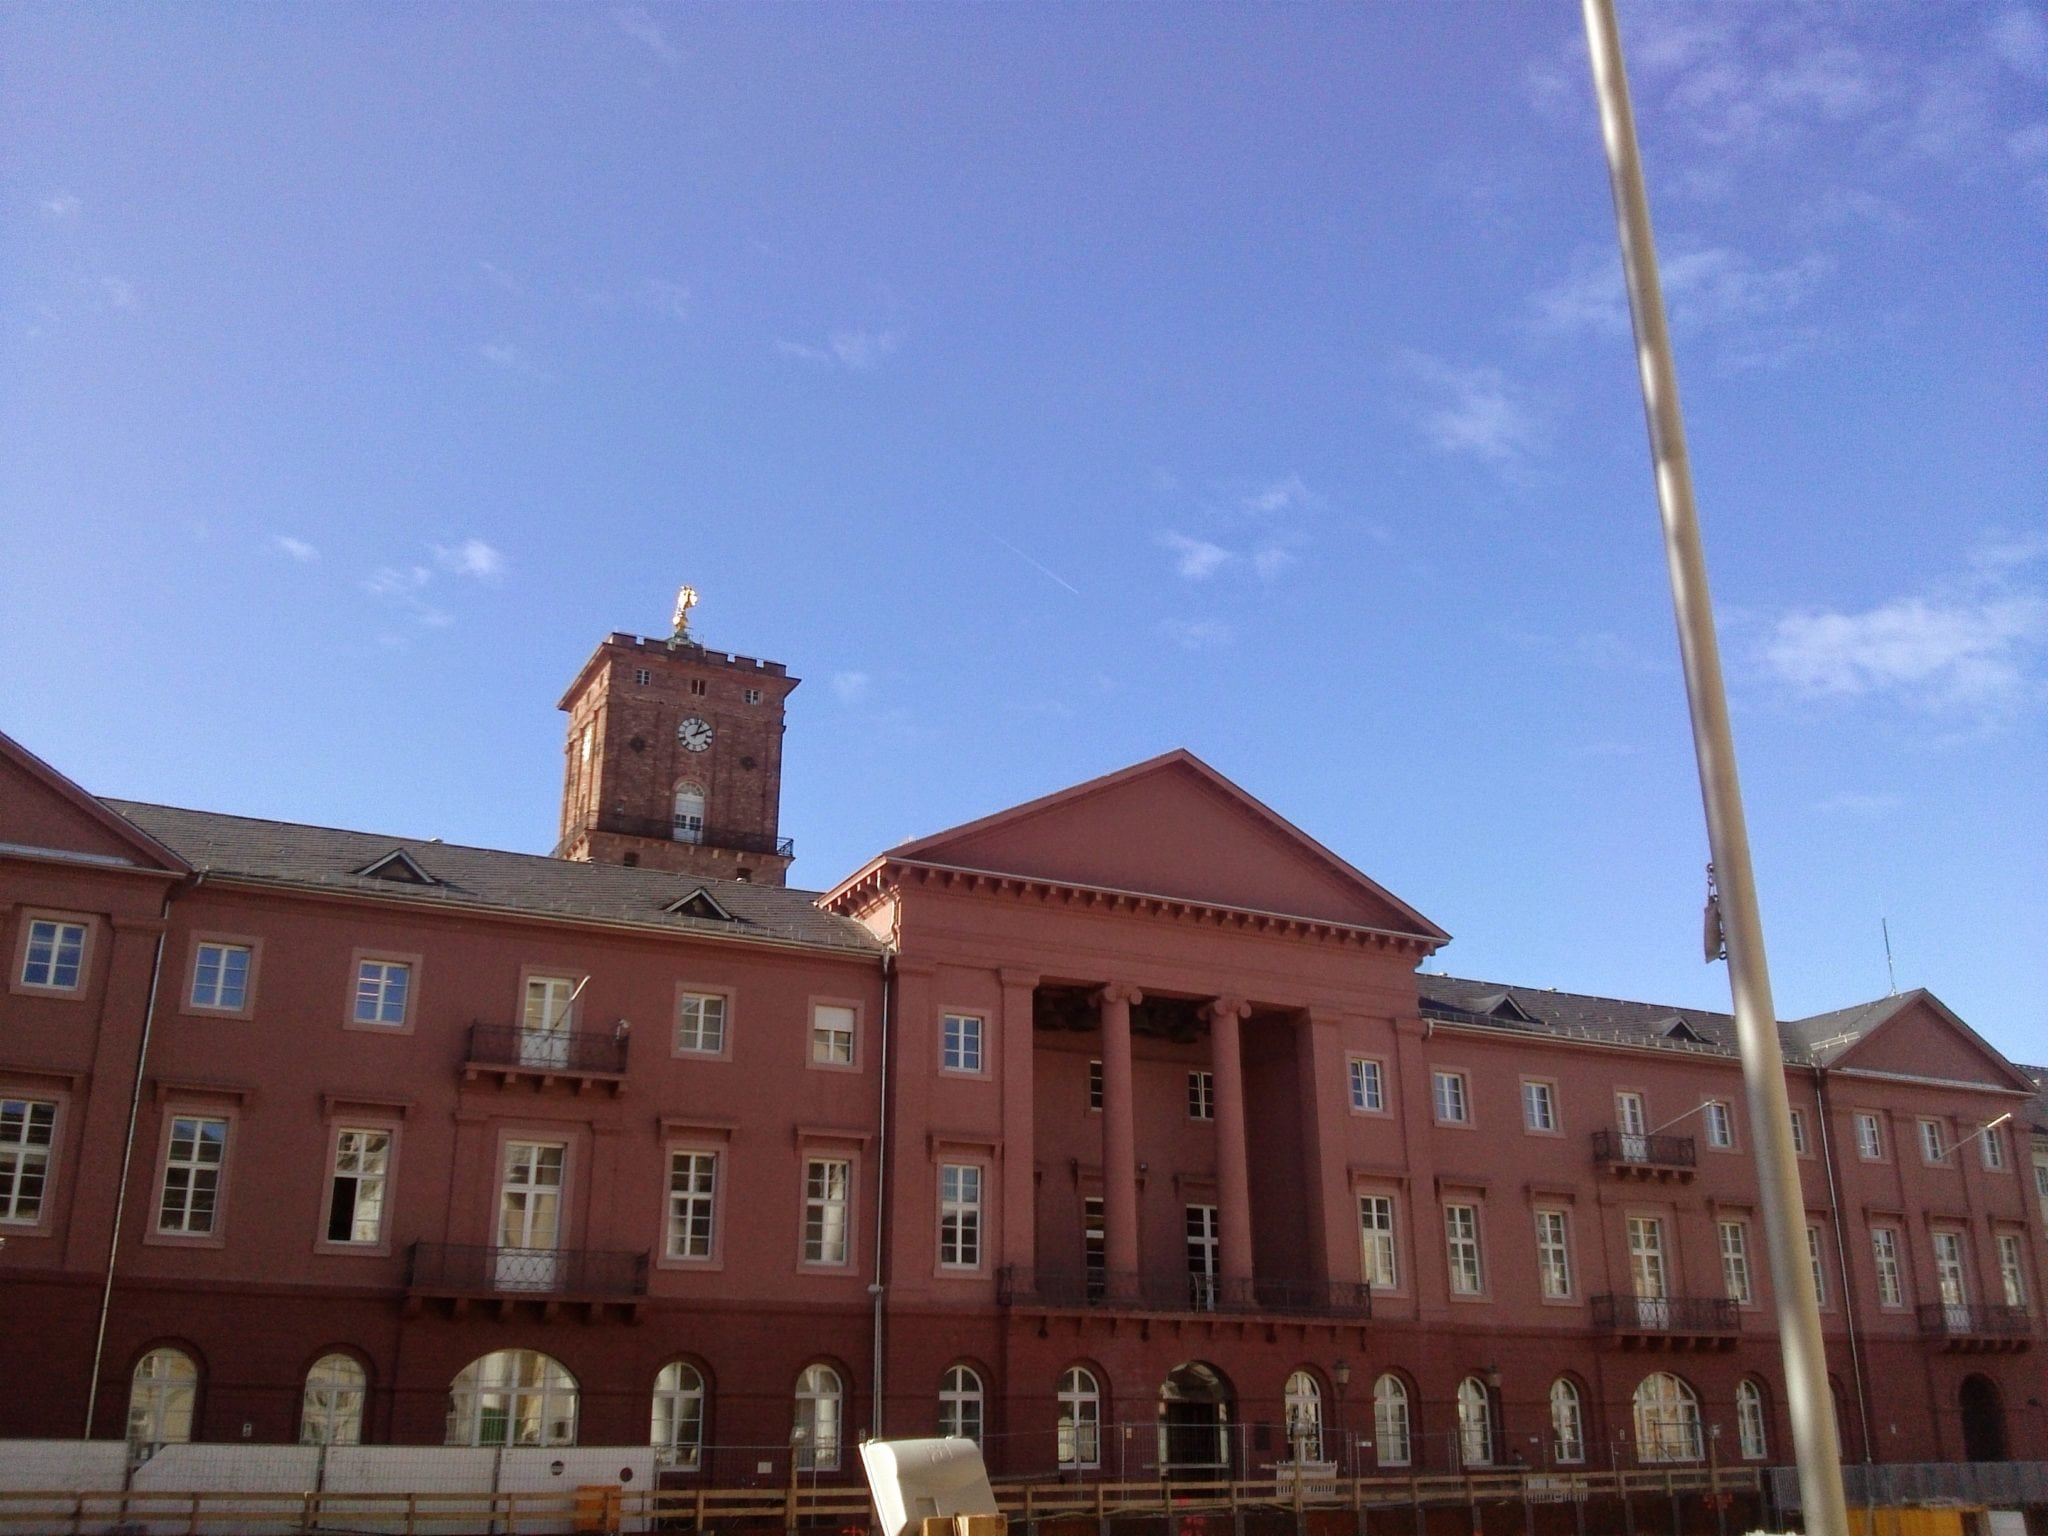 Karlsruher Rathaus mit Rathausturm